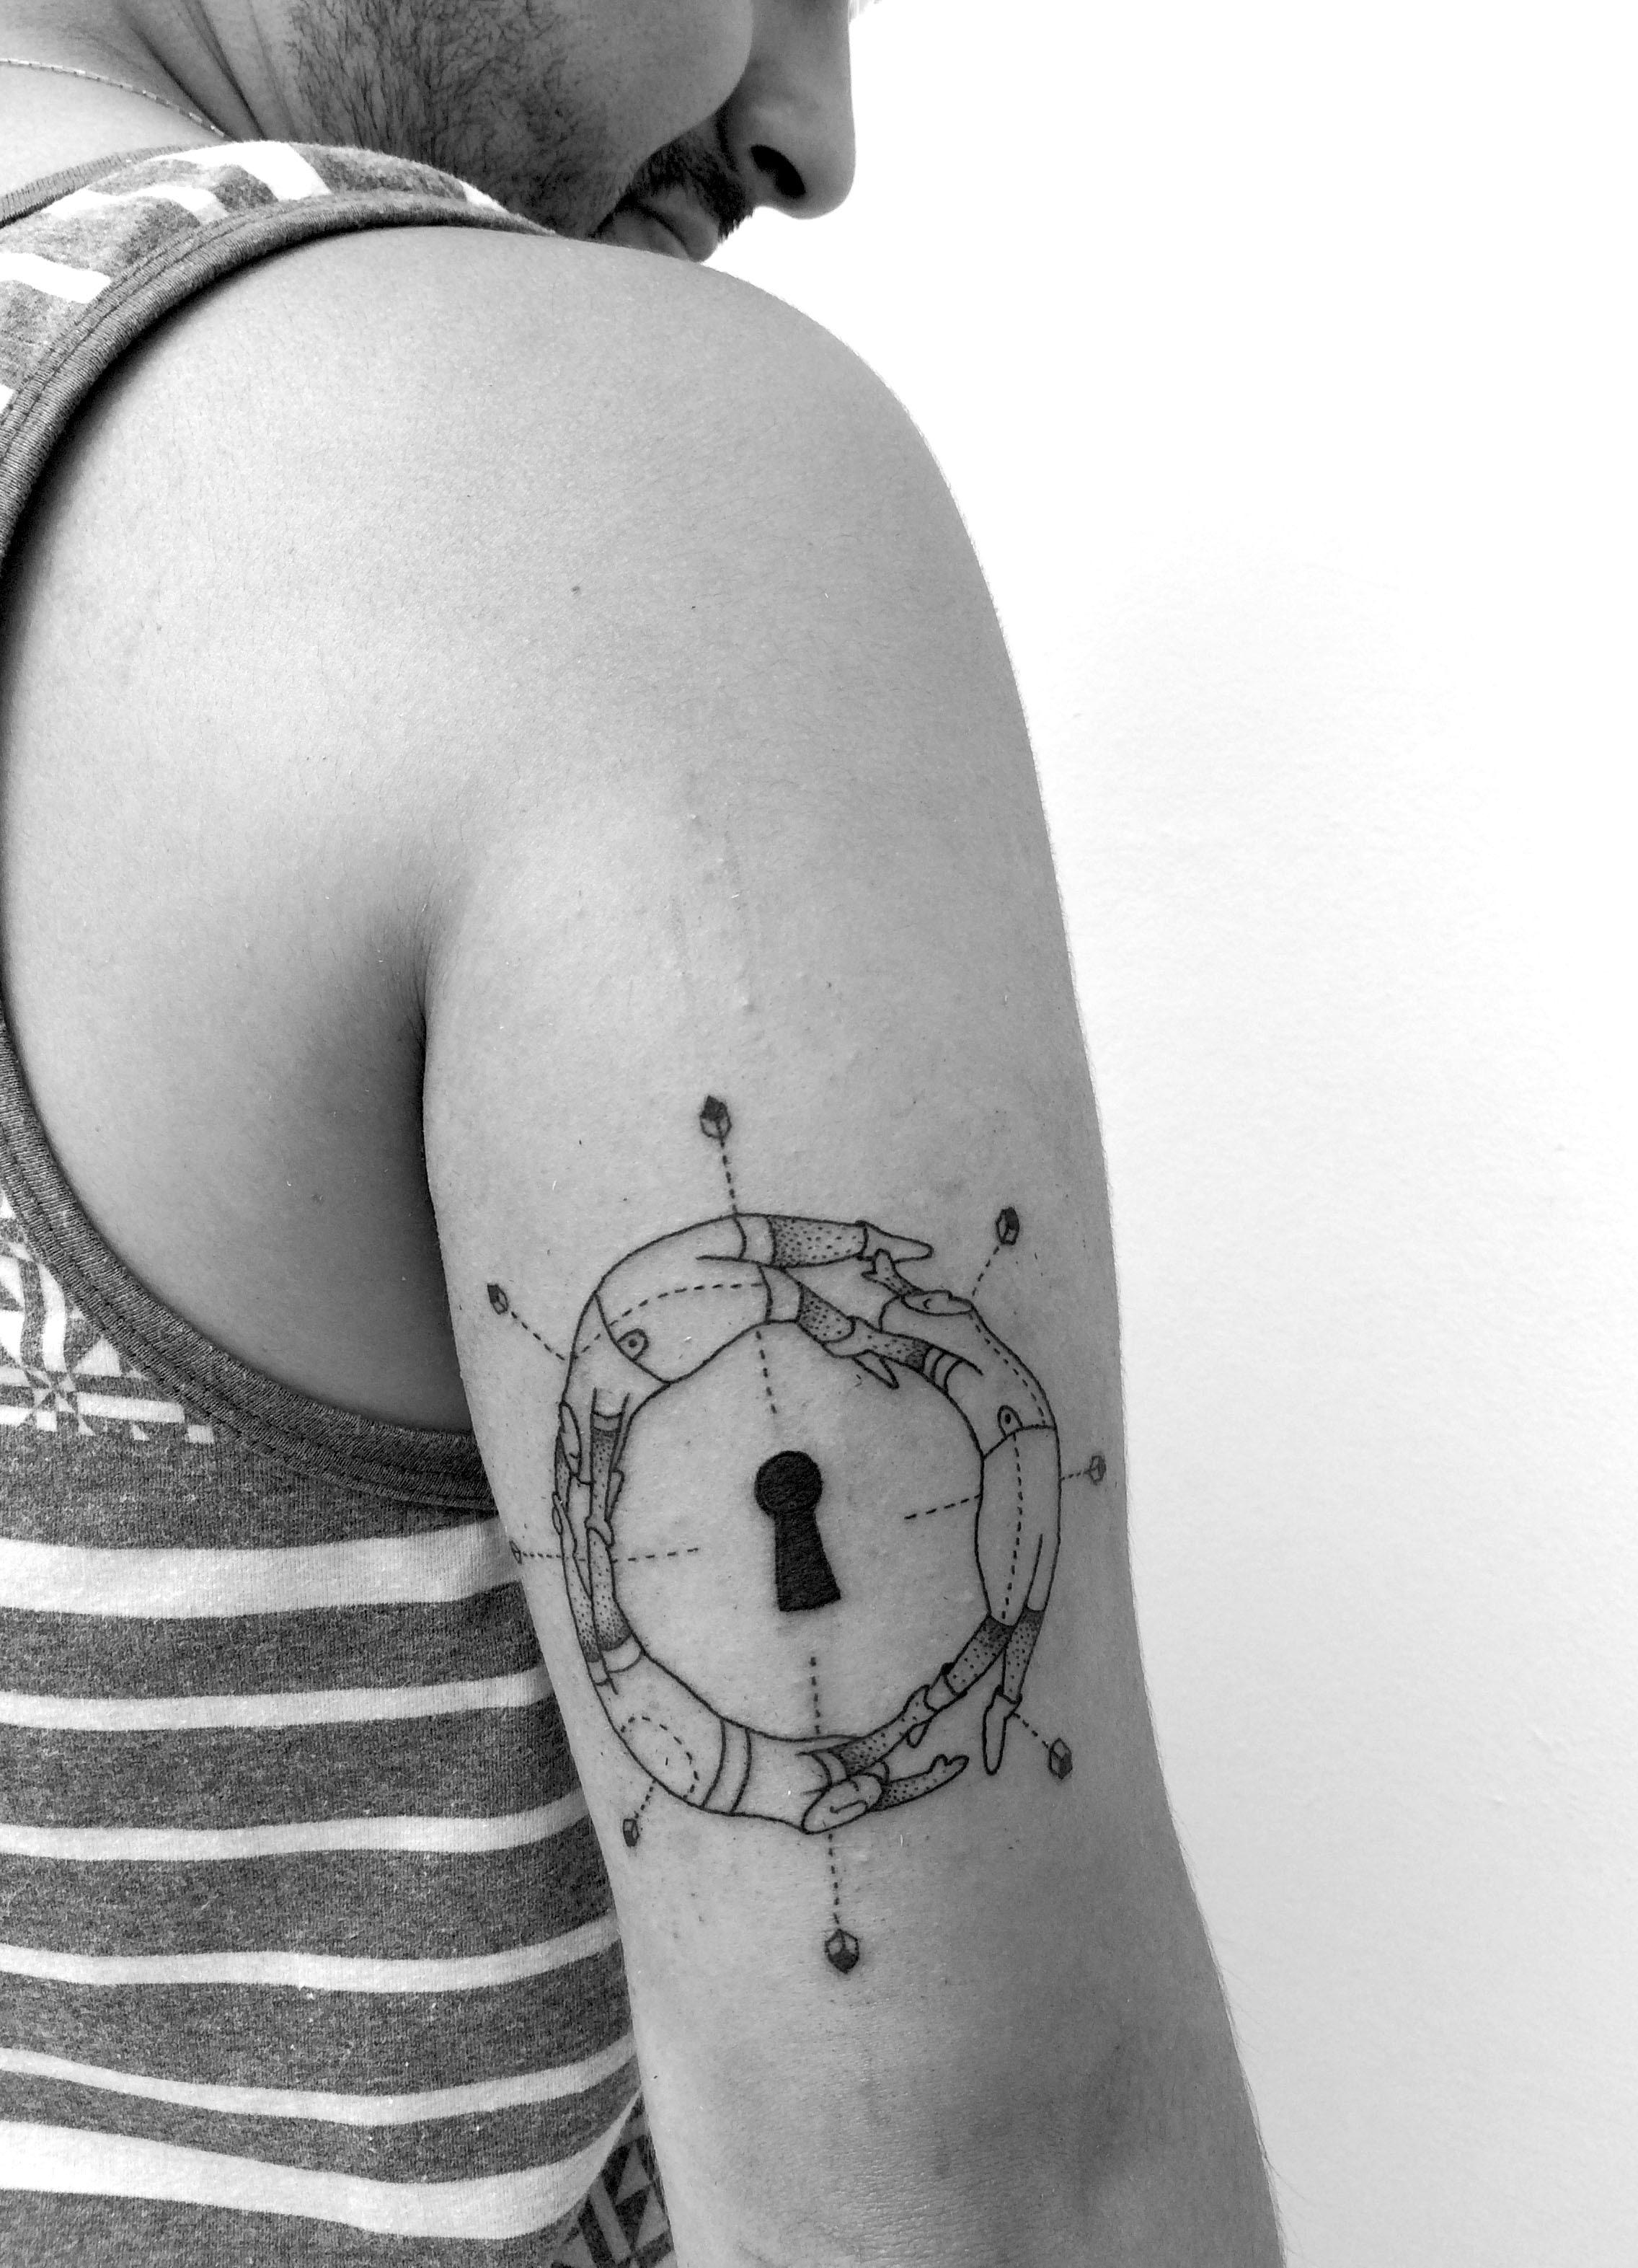 Rica_tattoo_bytamihopf.jpg